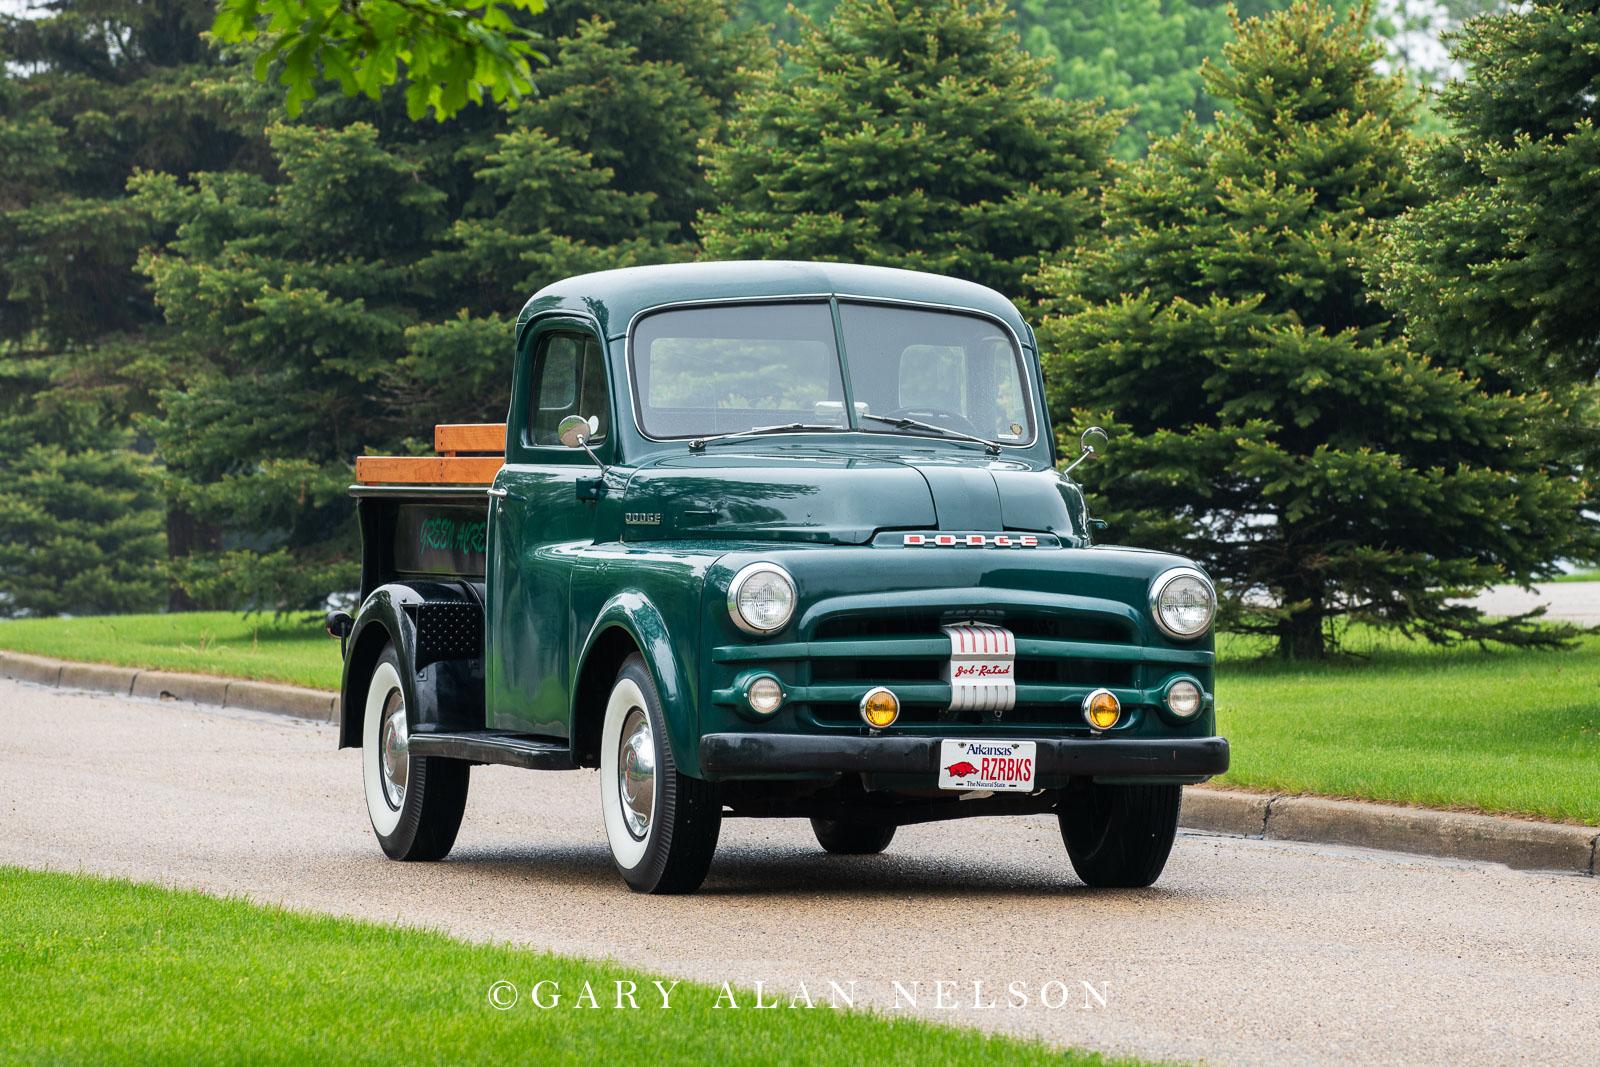 antique truck, dodge, vintage truck,1950 Dodge B-2-B 1/2 ton Pickup, photo